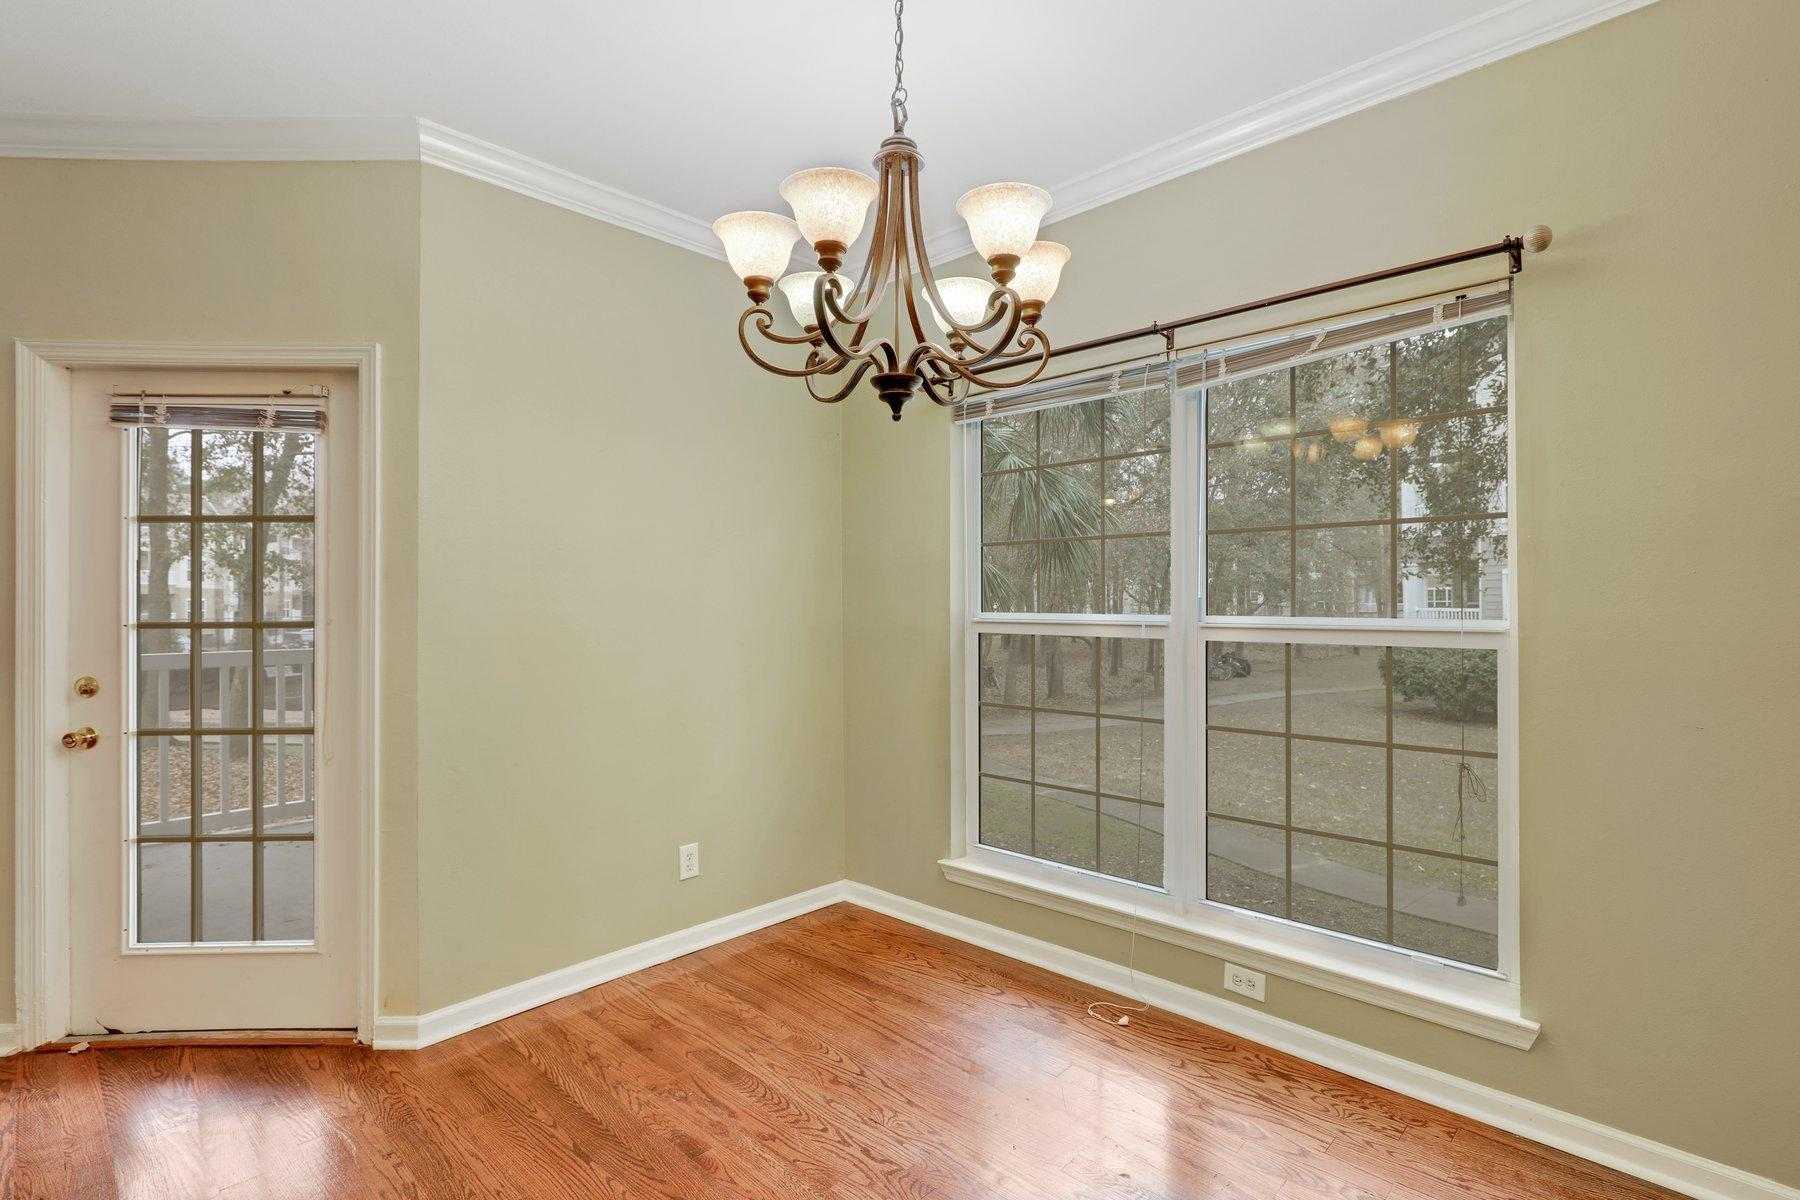 The Peninsula Condominiums Homes For Sale - 700 Daniel Ellis, Charleston, SC - 5